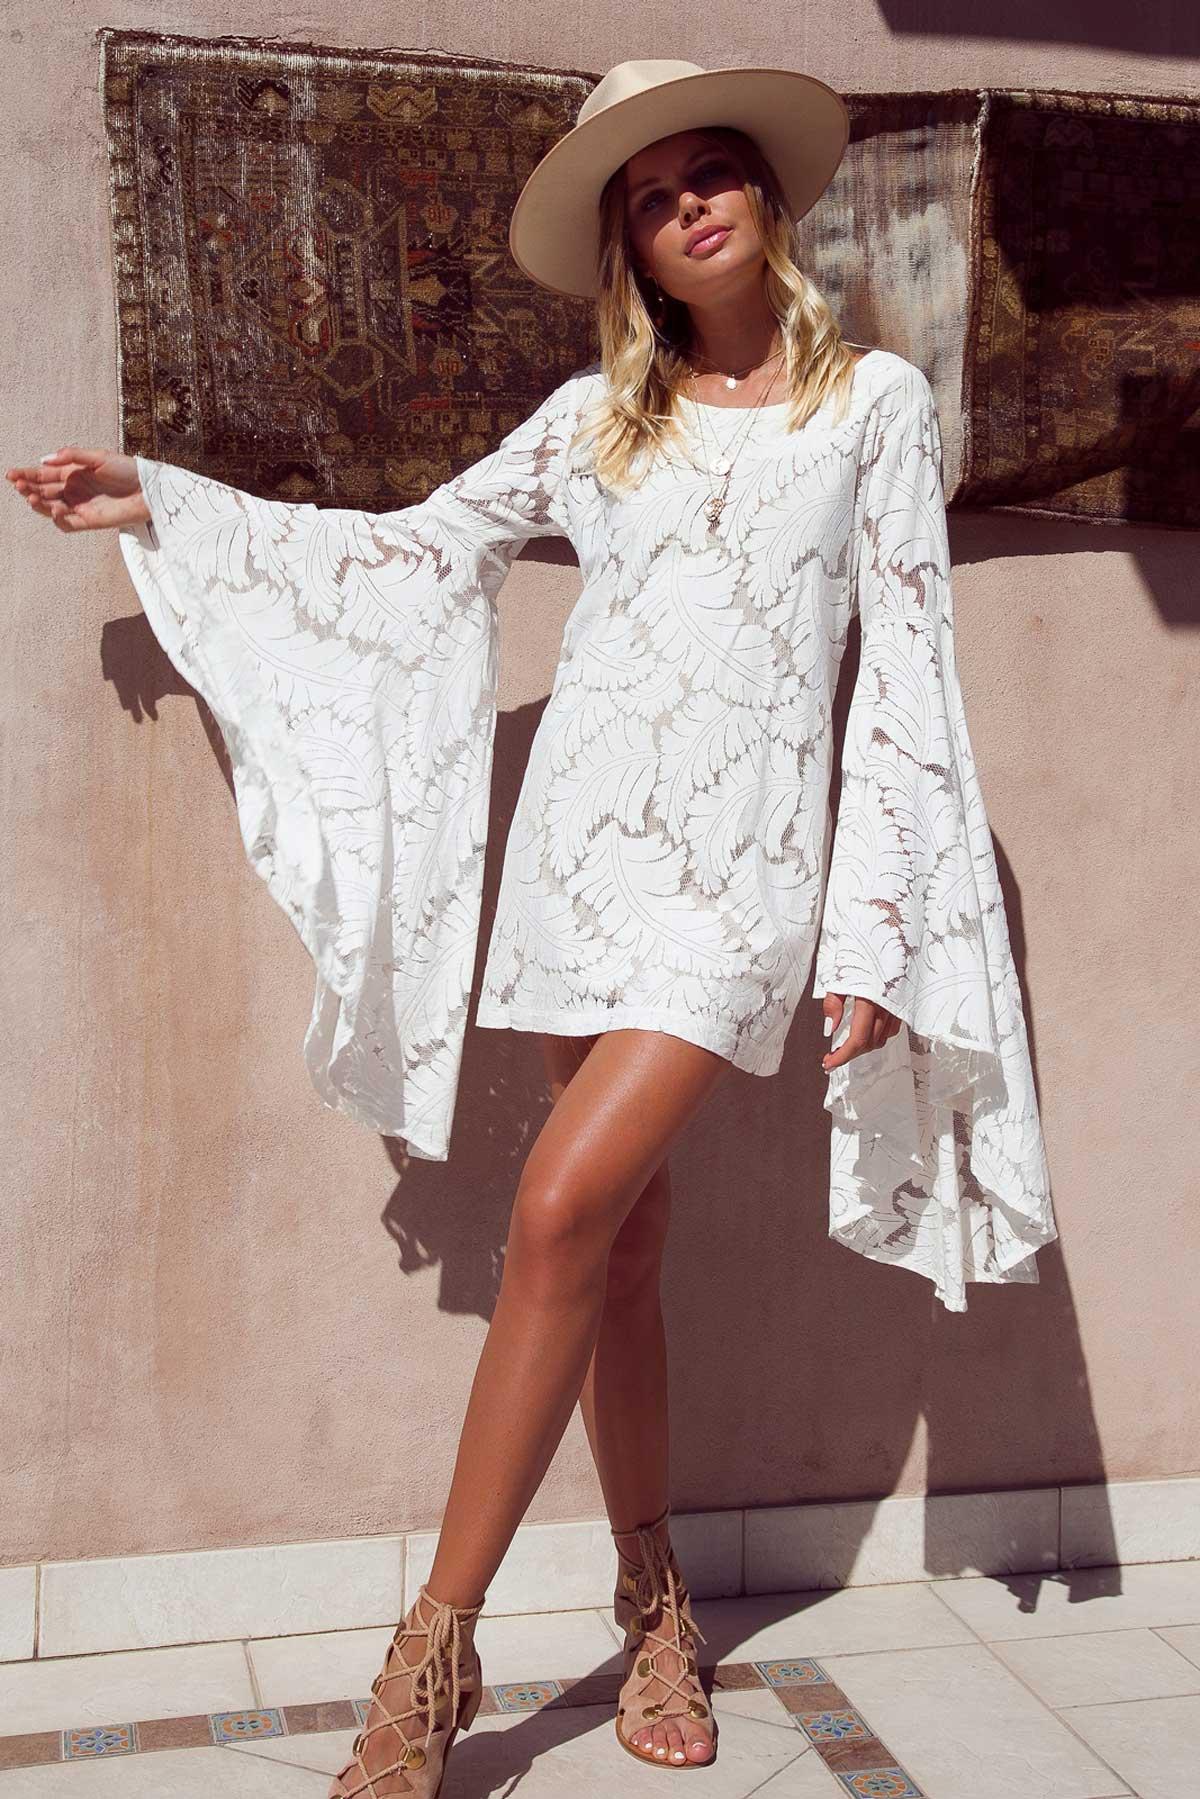 b99770158b8d2 PC-fleur-lace-dress-bohemian-bell-sleeves-hippie-